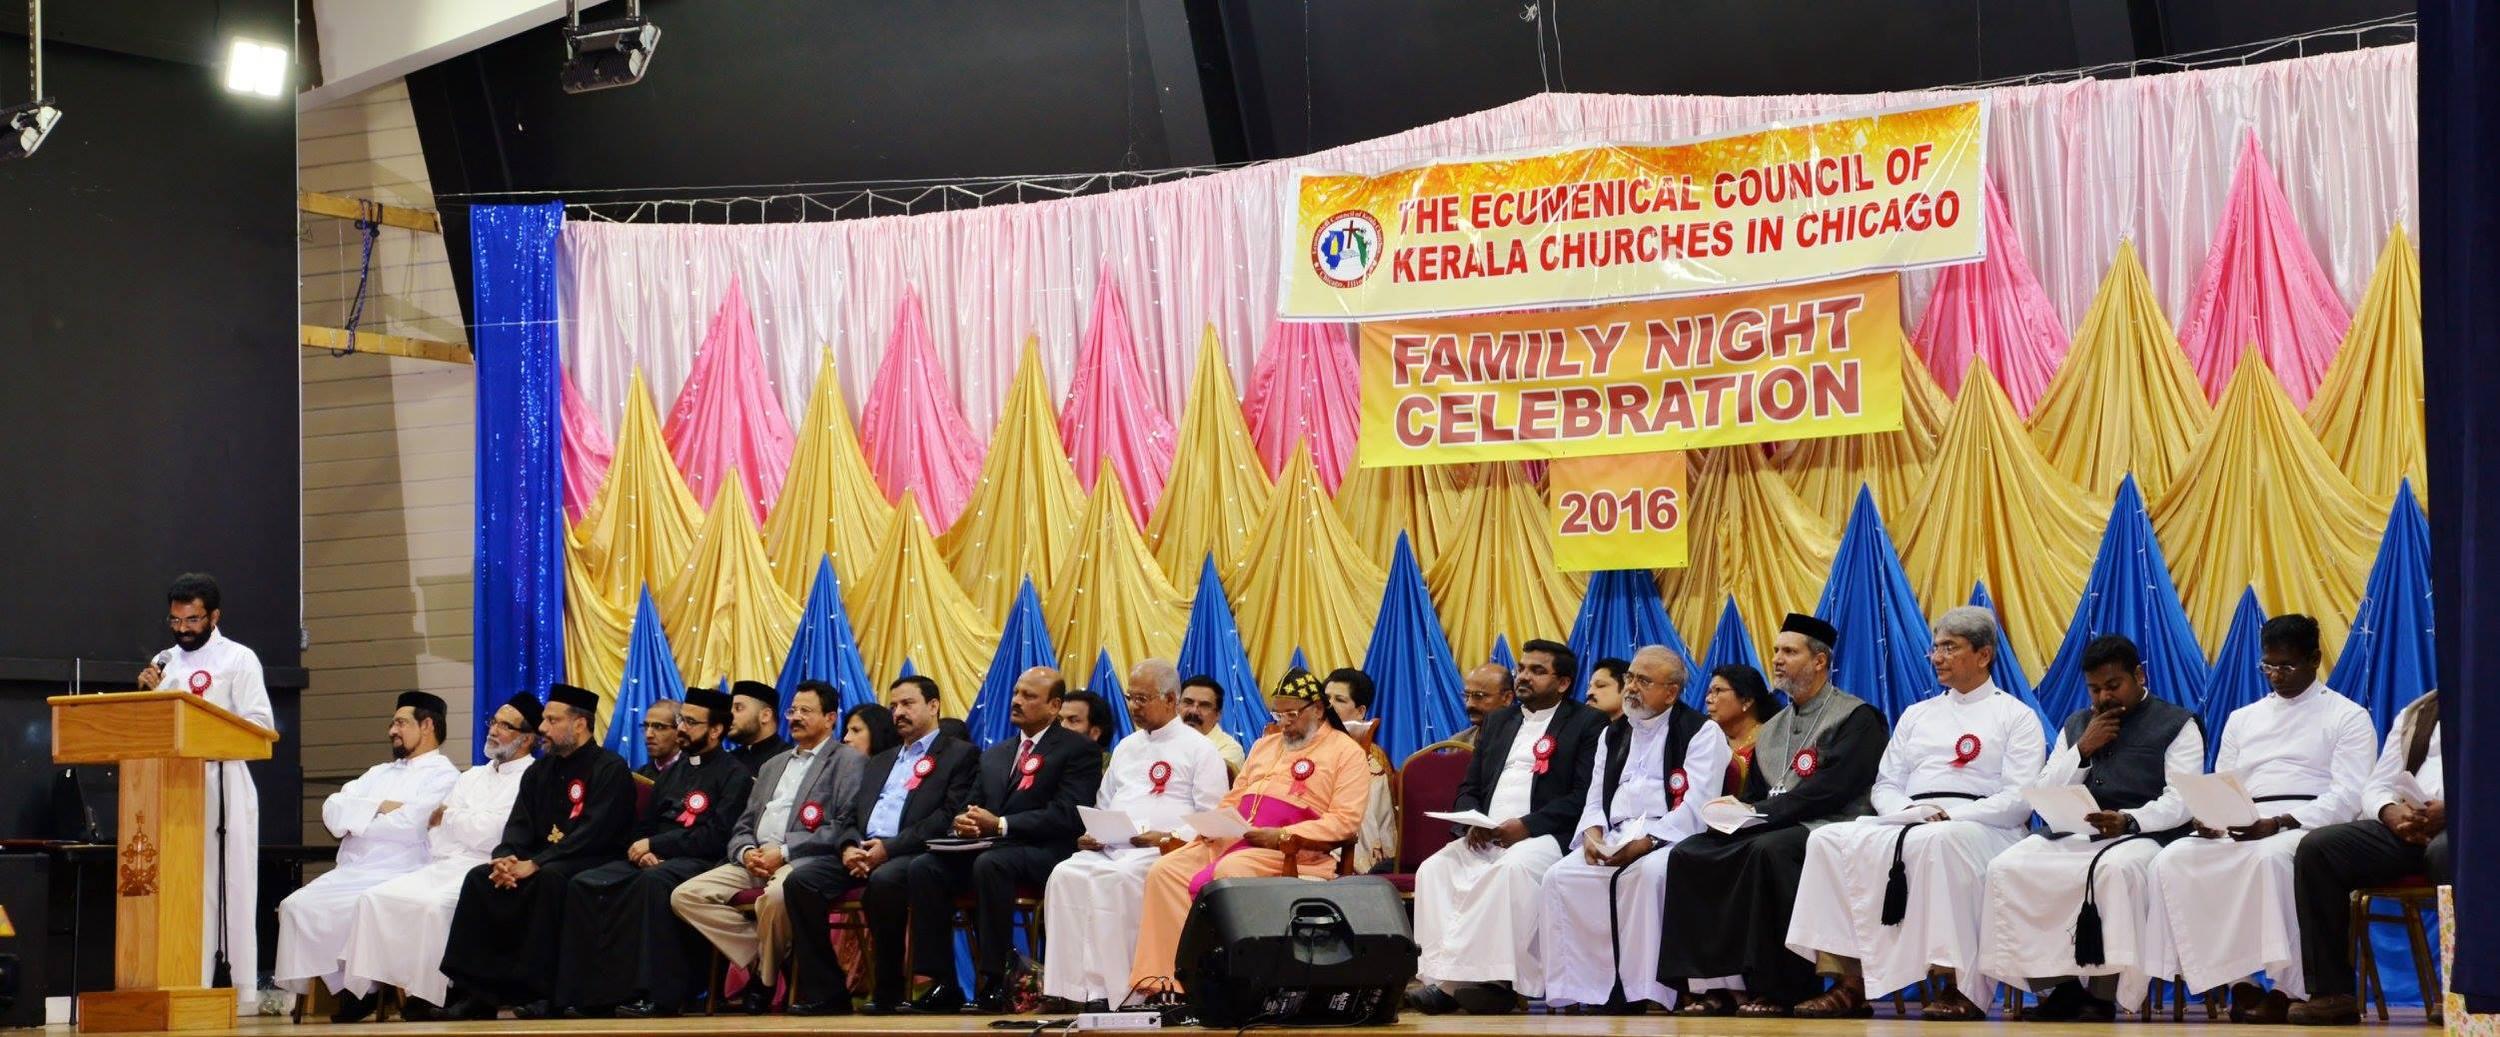 Ecumenical Family NIght